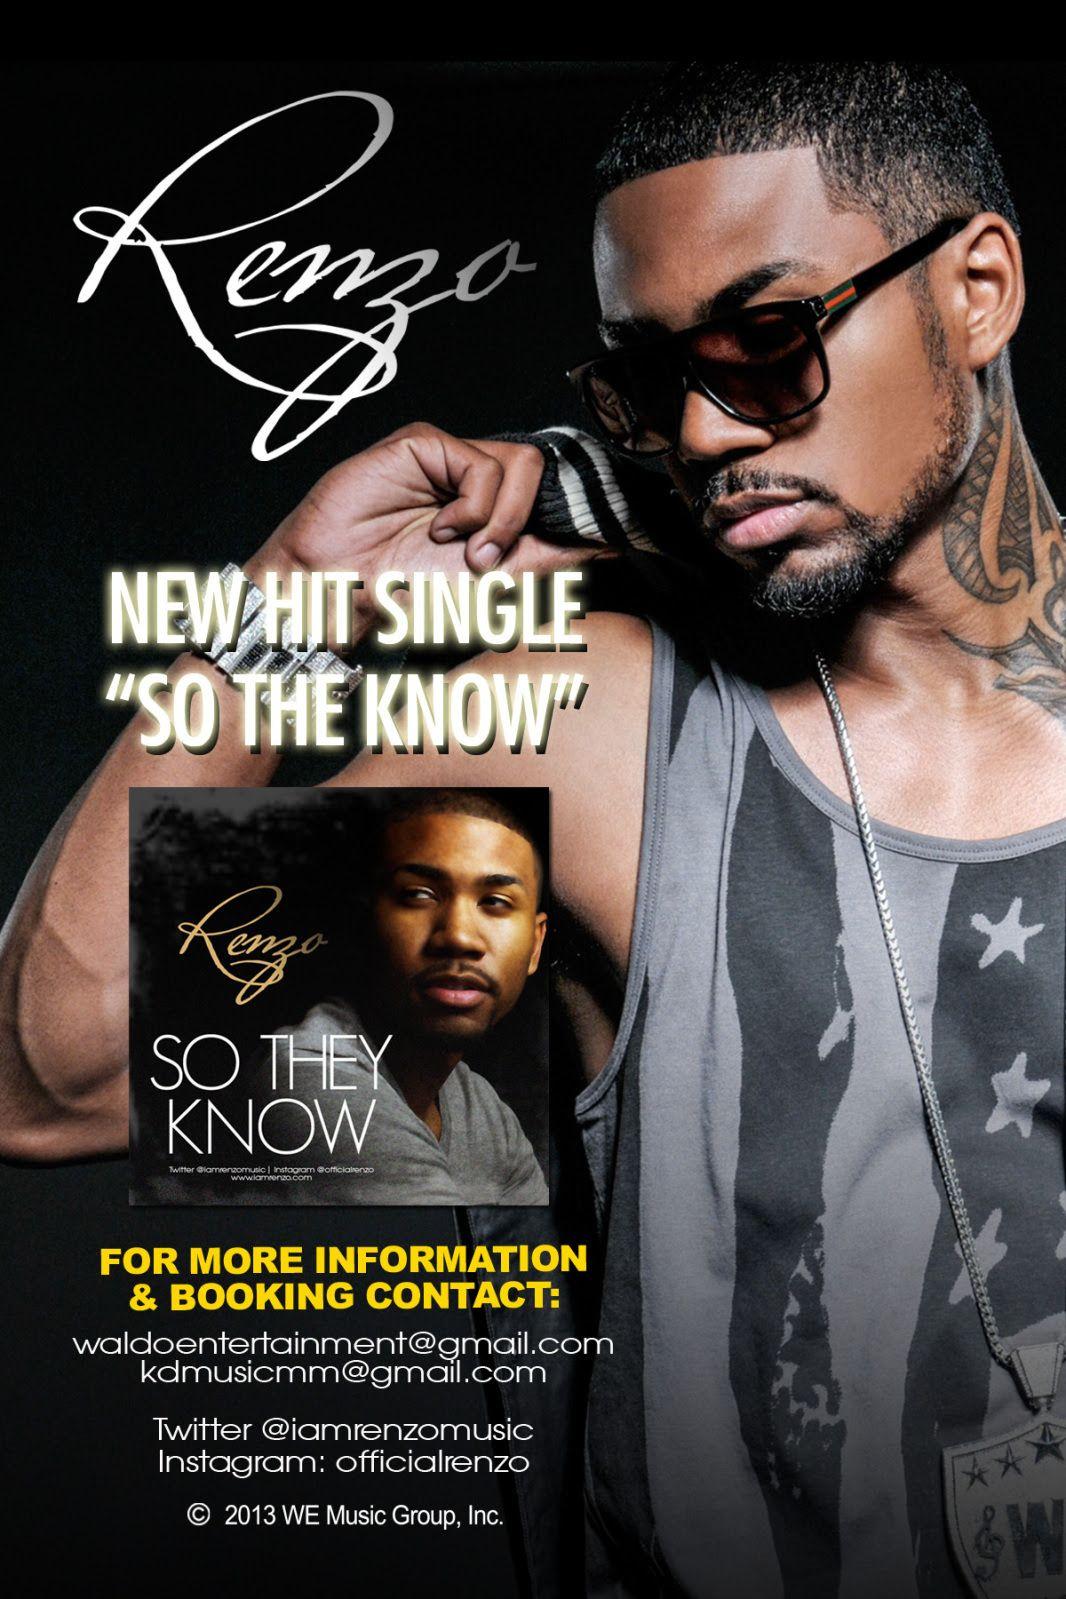 "R&B ARTIST RENZO DROPS NEW SINGLE ""So They Know"" #newmusic"